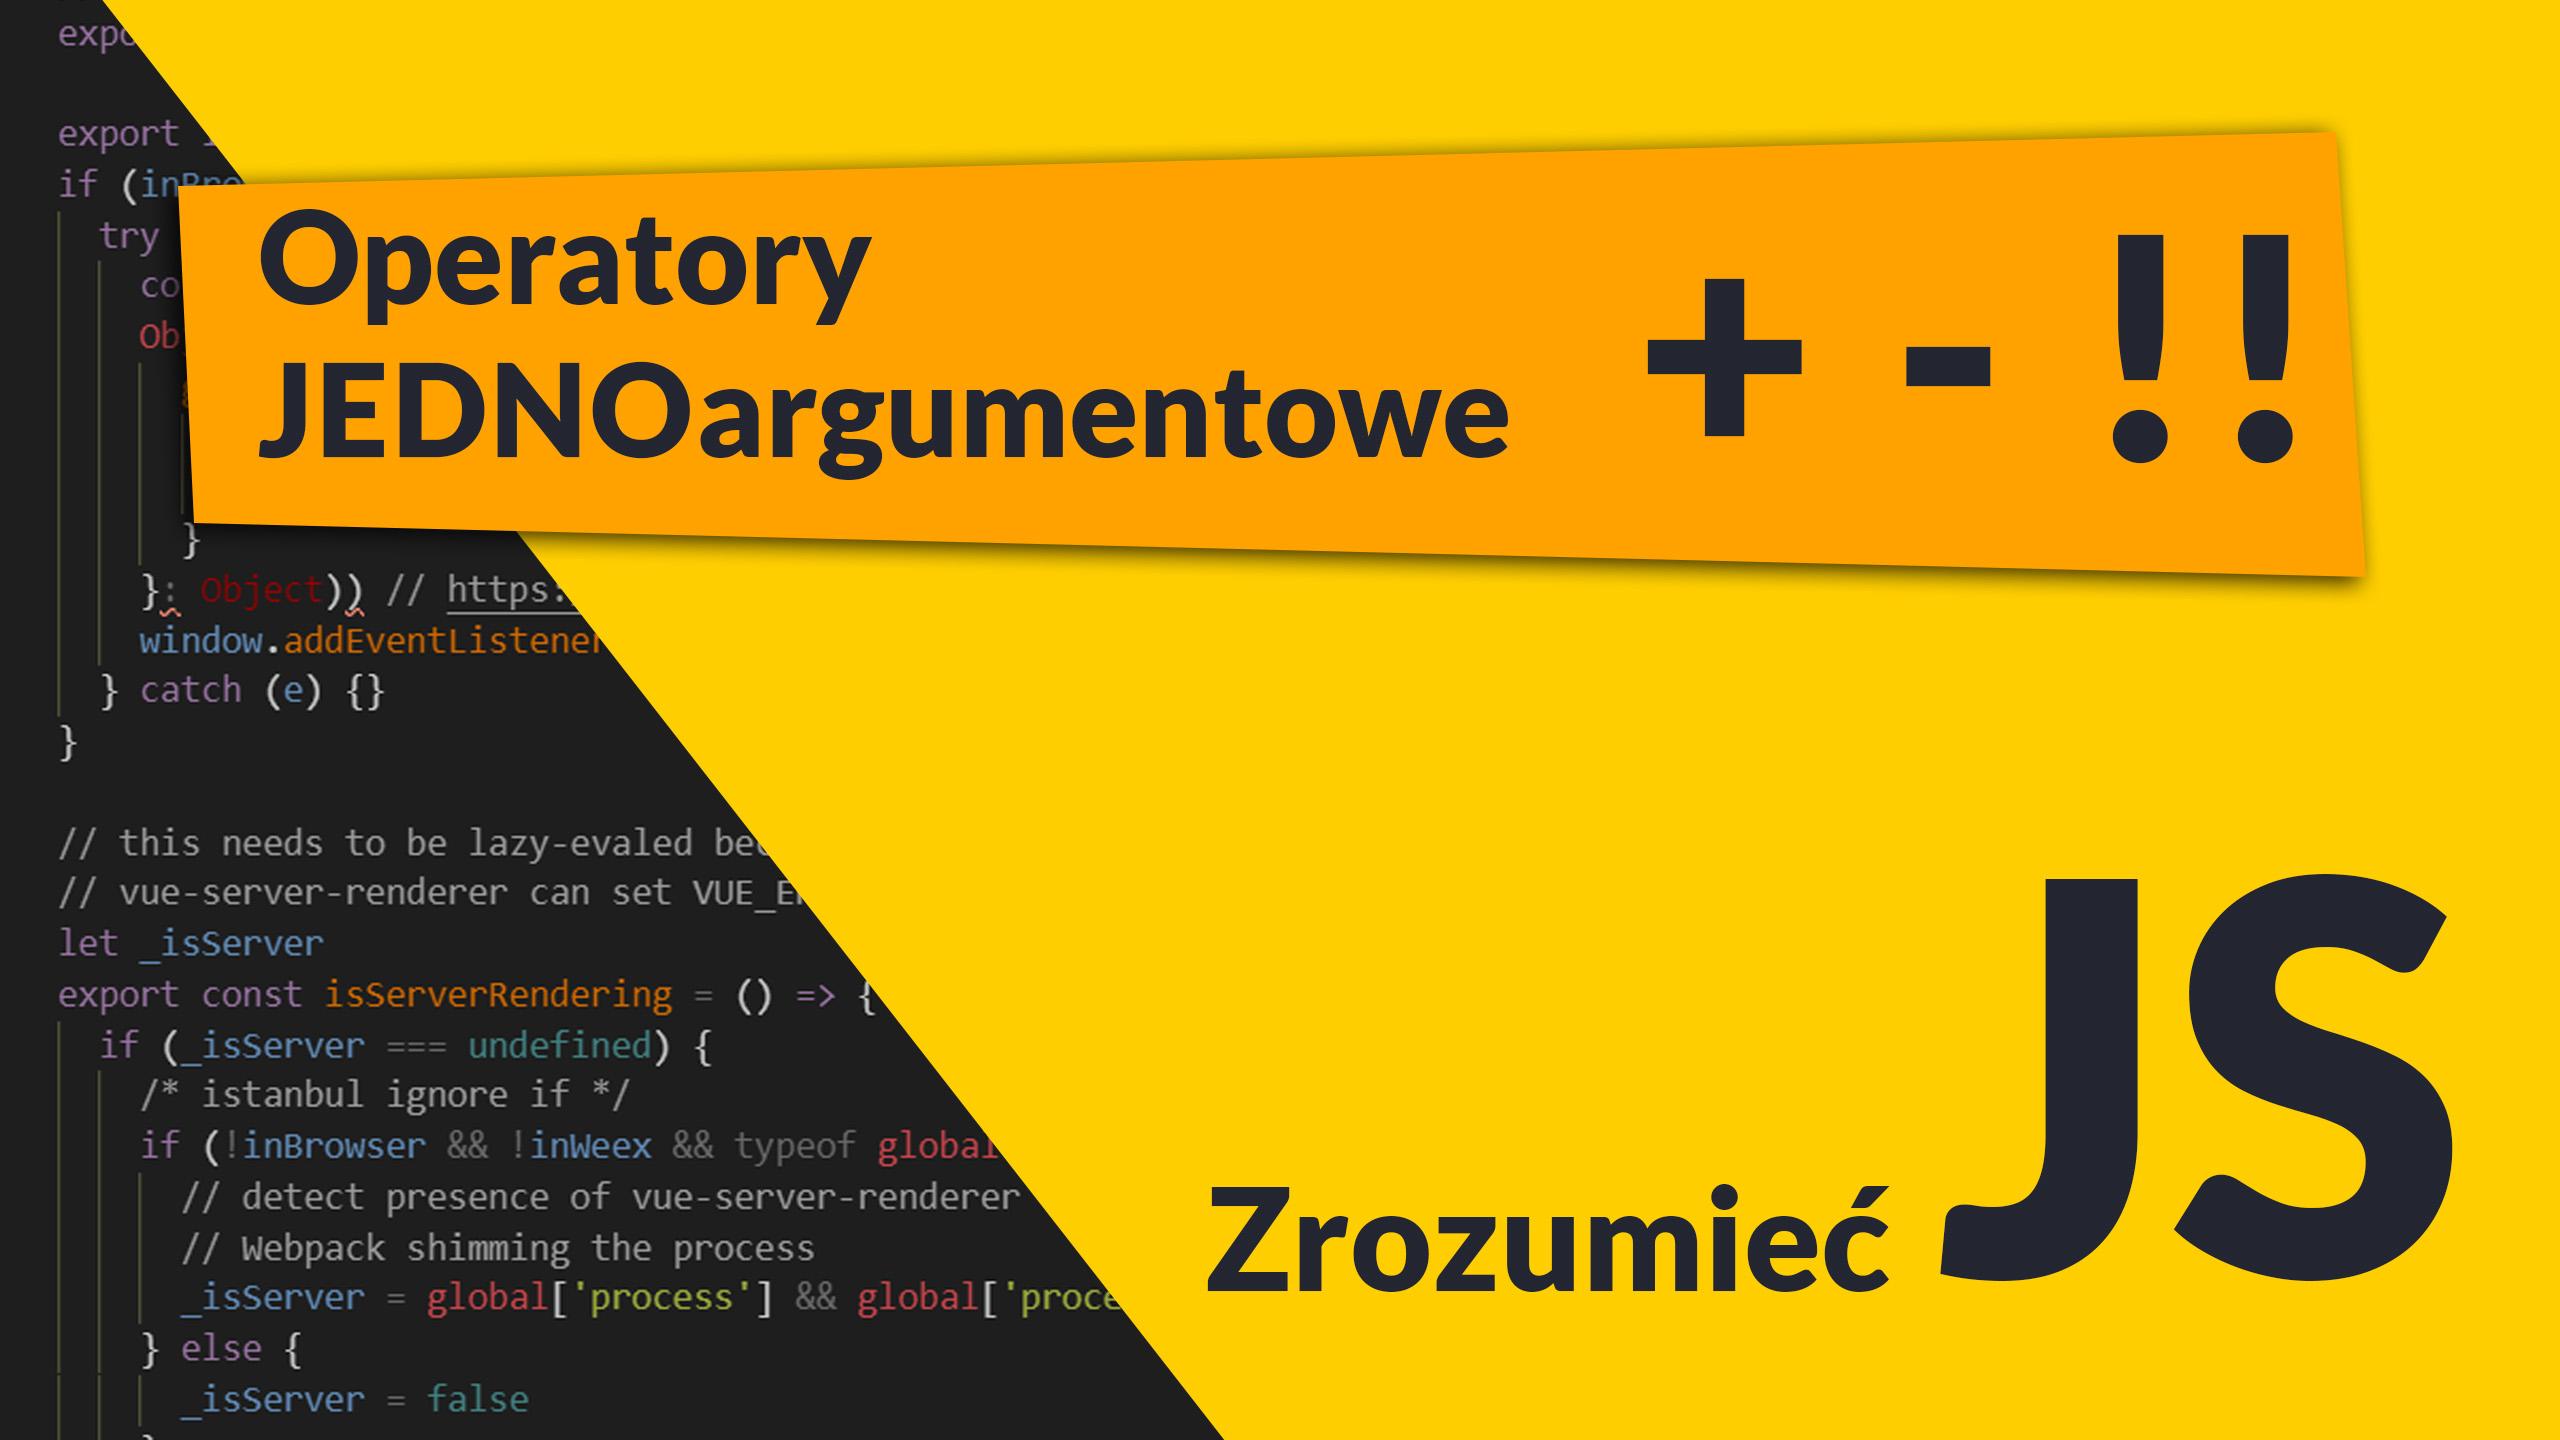 unary operators - Operatory JEDNOargumentowe + - !! (#5 Zrozumieć JavaScript)